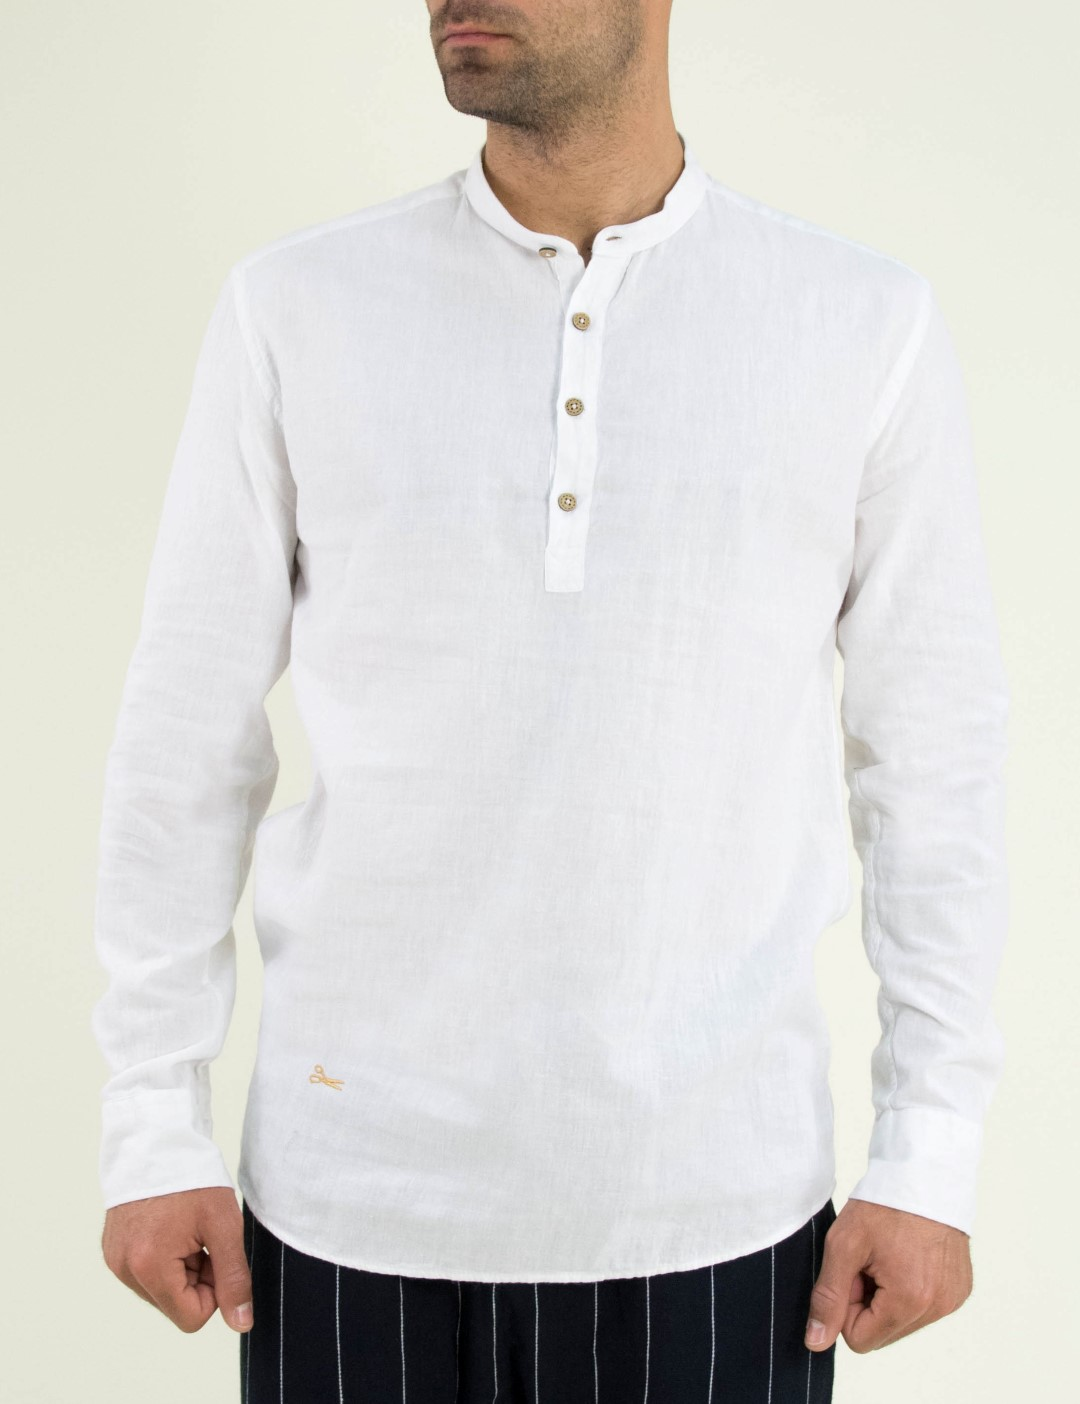 c6a8a1f0080b Ανδρικό λευκό πουκάμισο Ben Tailor μαο γιακά 1128Q